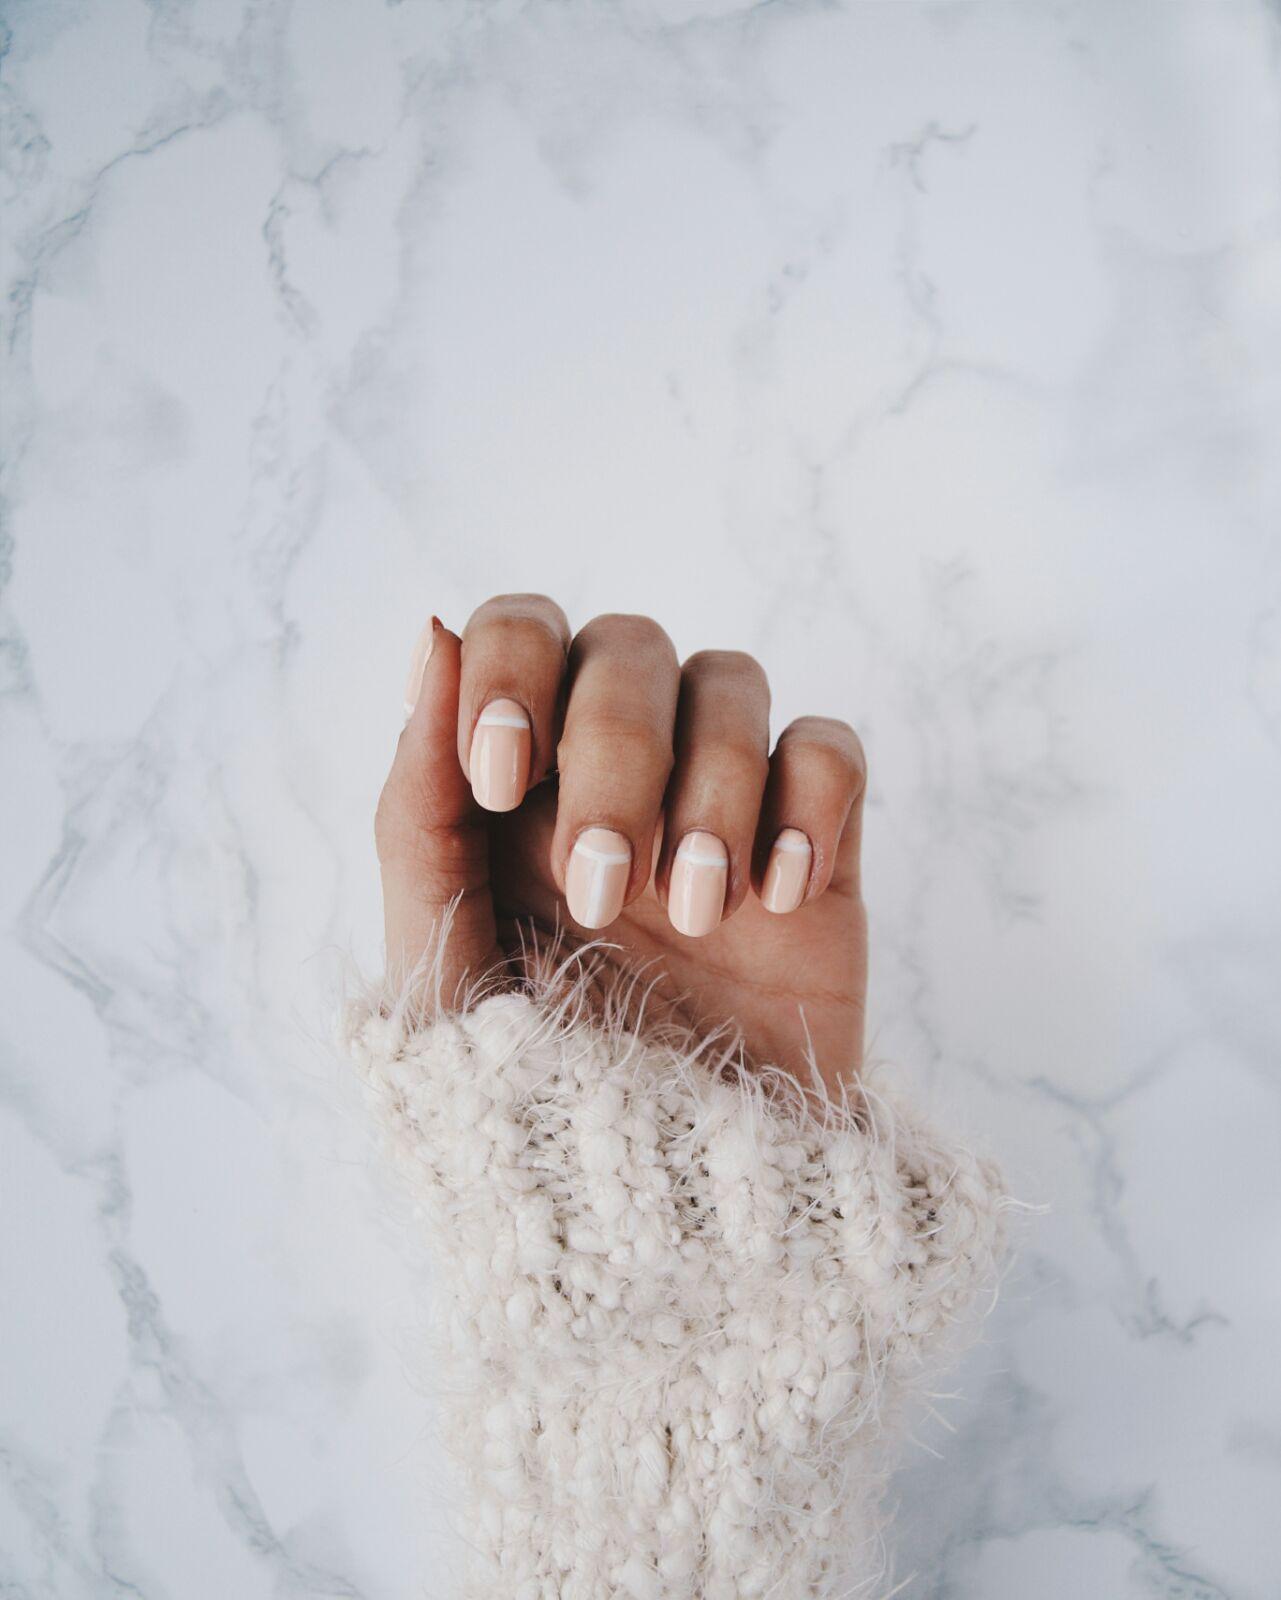 coastalandco-minimal-manucure-manicure-beauty-beaute-belleza-manicura-beige-white-nude-sephora-kiko-mac-nars